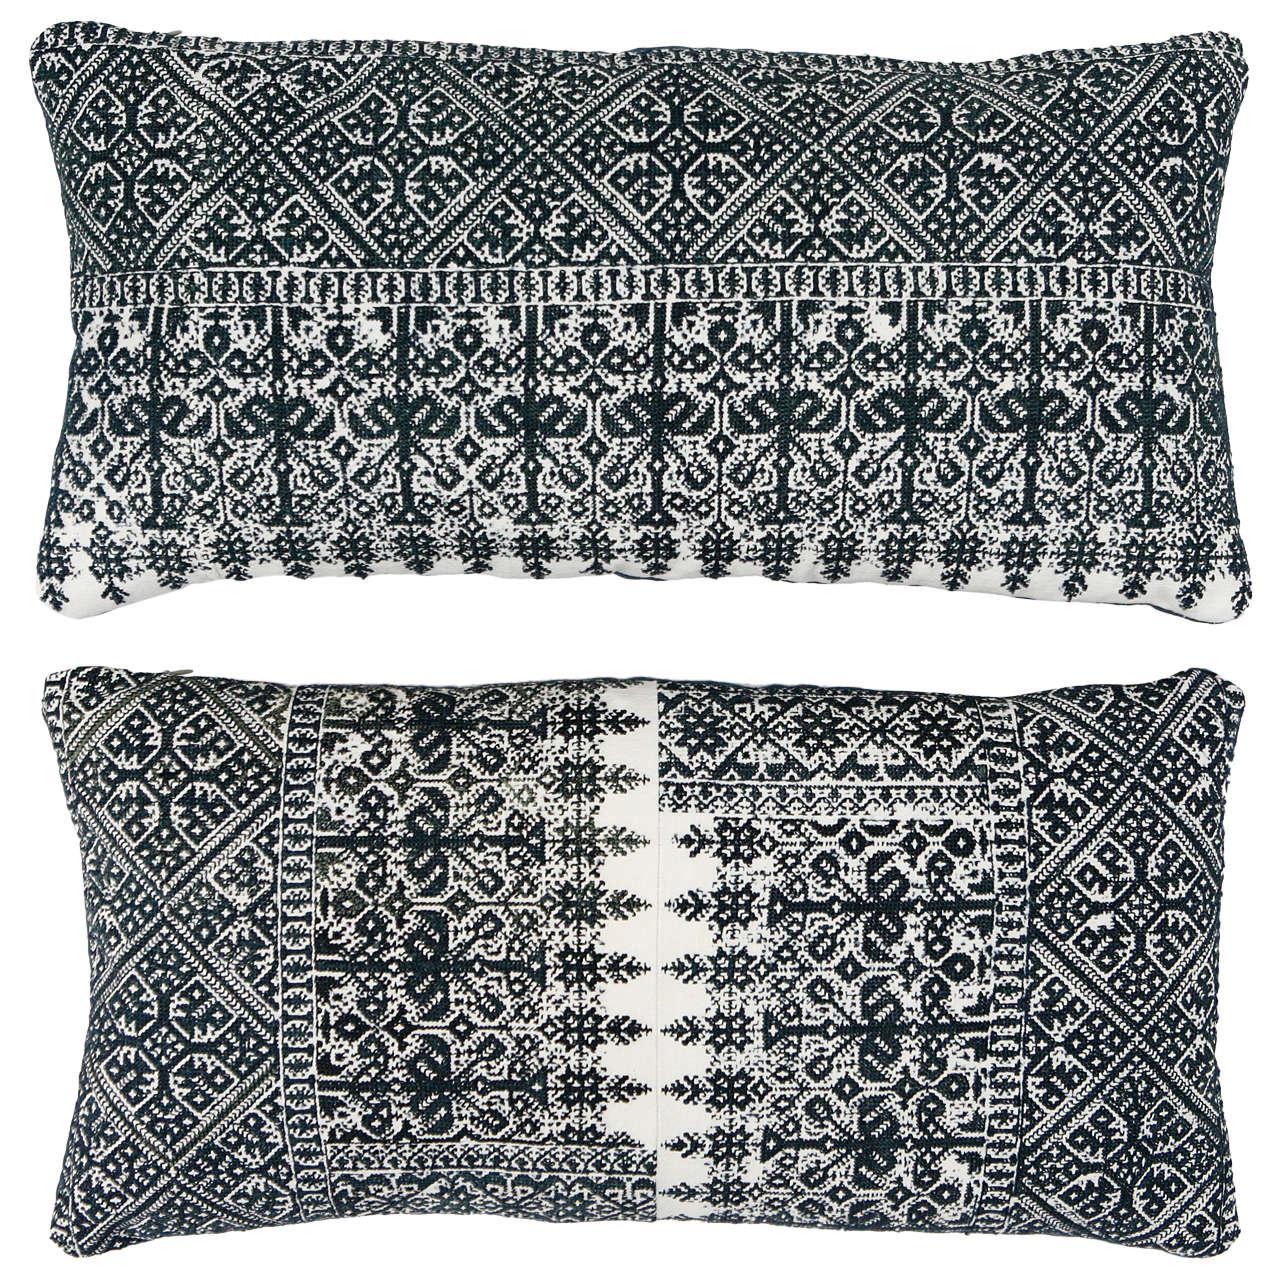 Moroccan Fez Embroidery Pillows